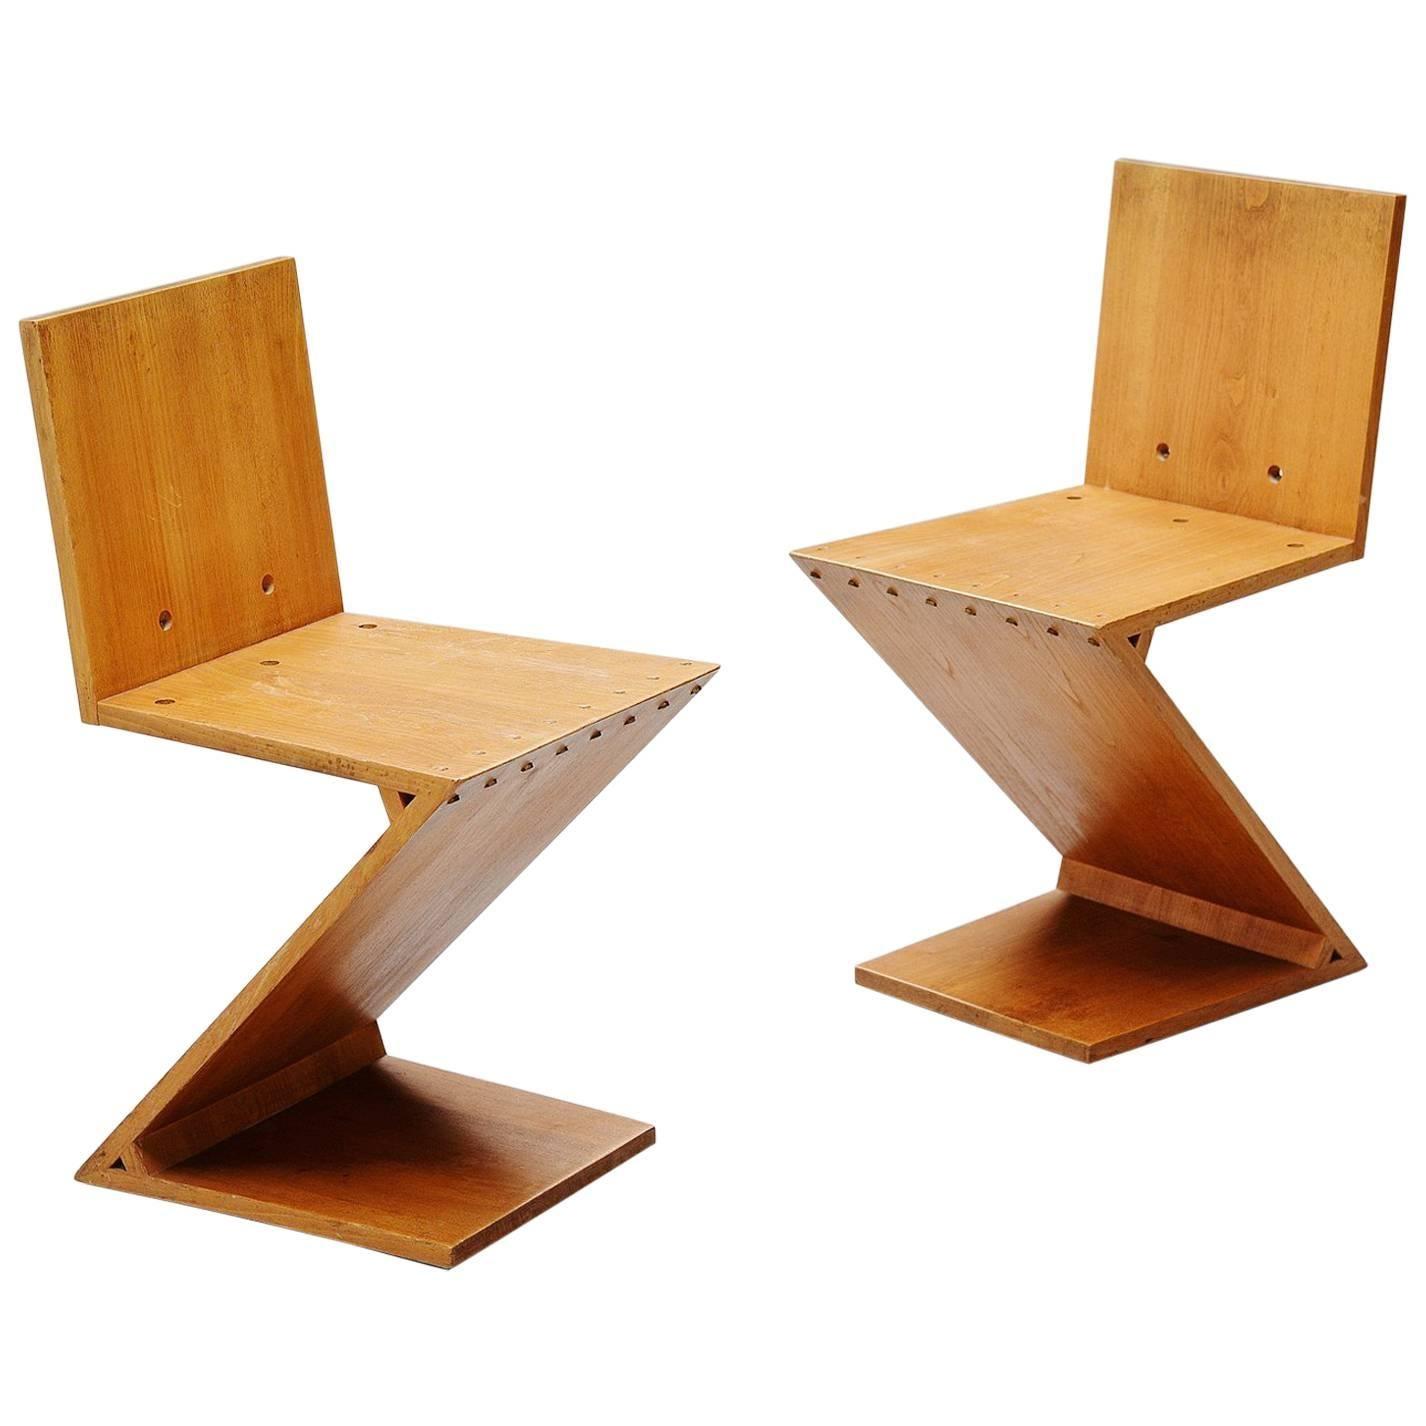 Gerrit Rietveld Zig Zag Chair Pair G.A.v.d. Groenekan, 1965